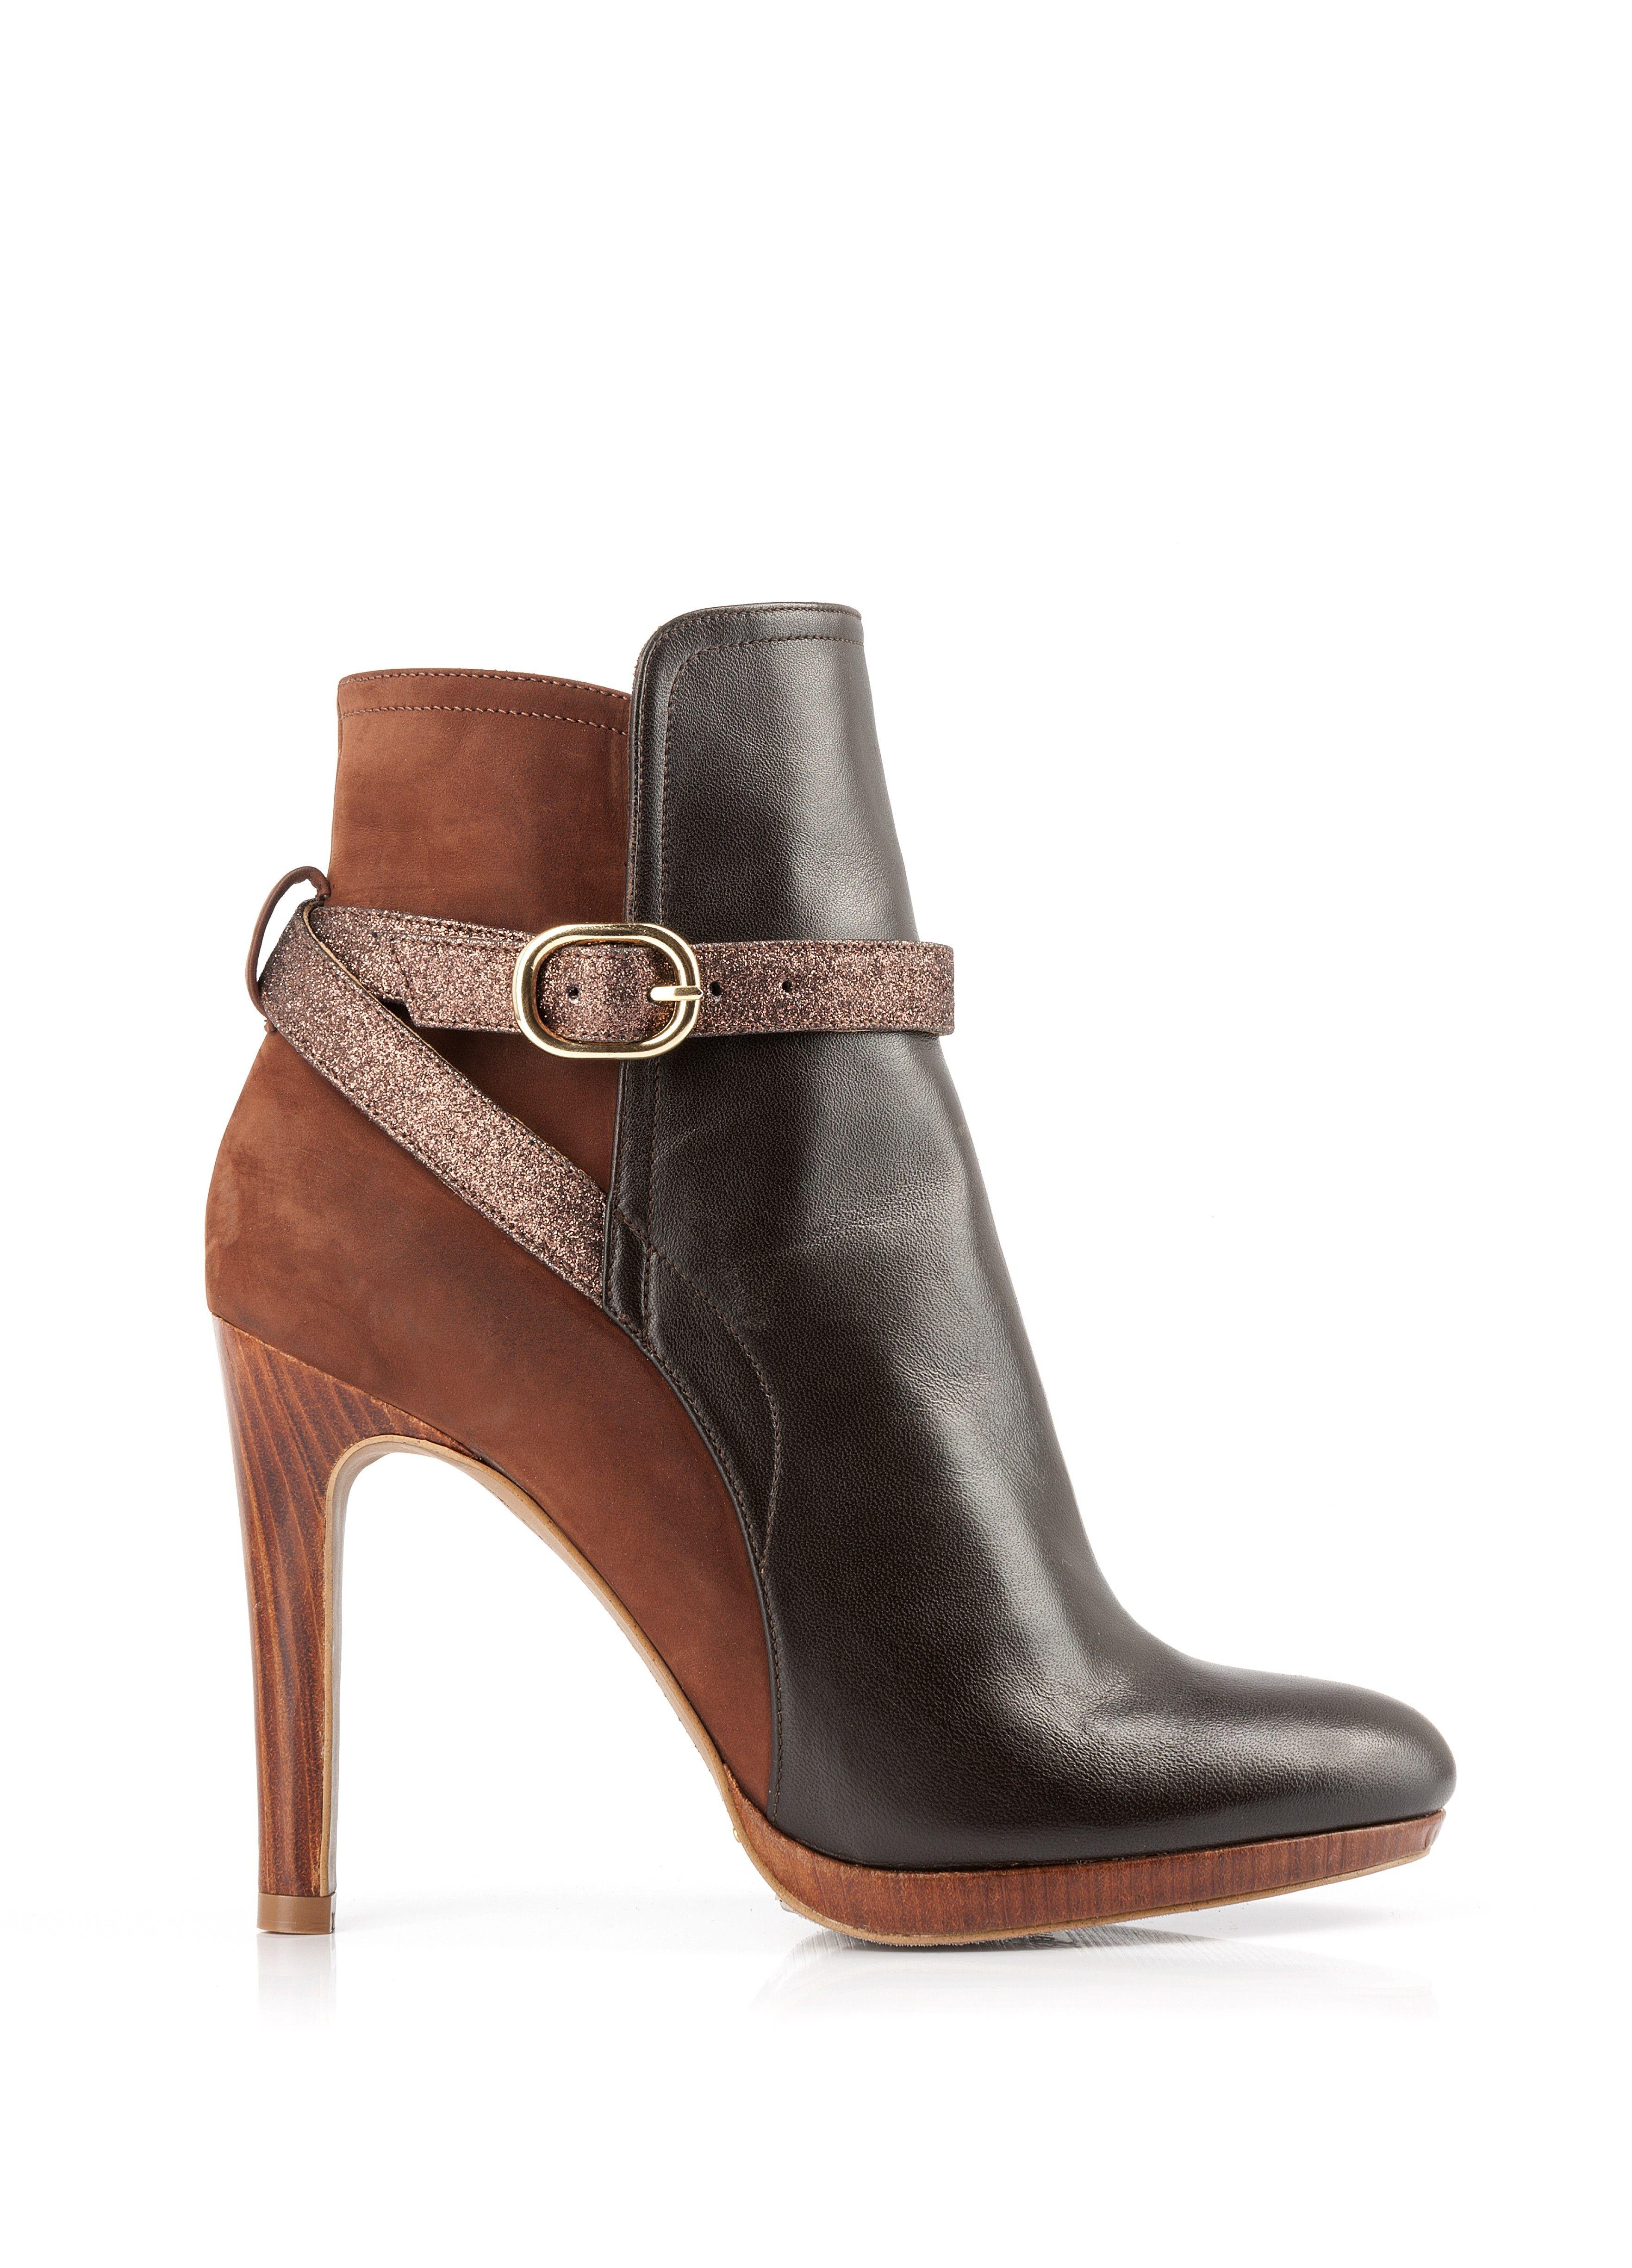 bottine talon trust marron bottines talon chaussures femme femme shoes. Black Bedroom Furniture Sets. Home Design Ideas